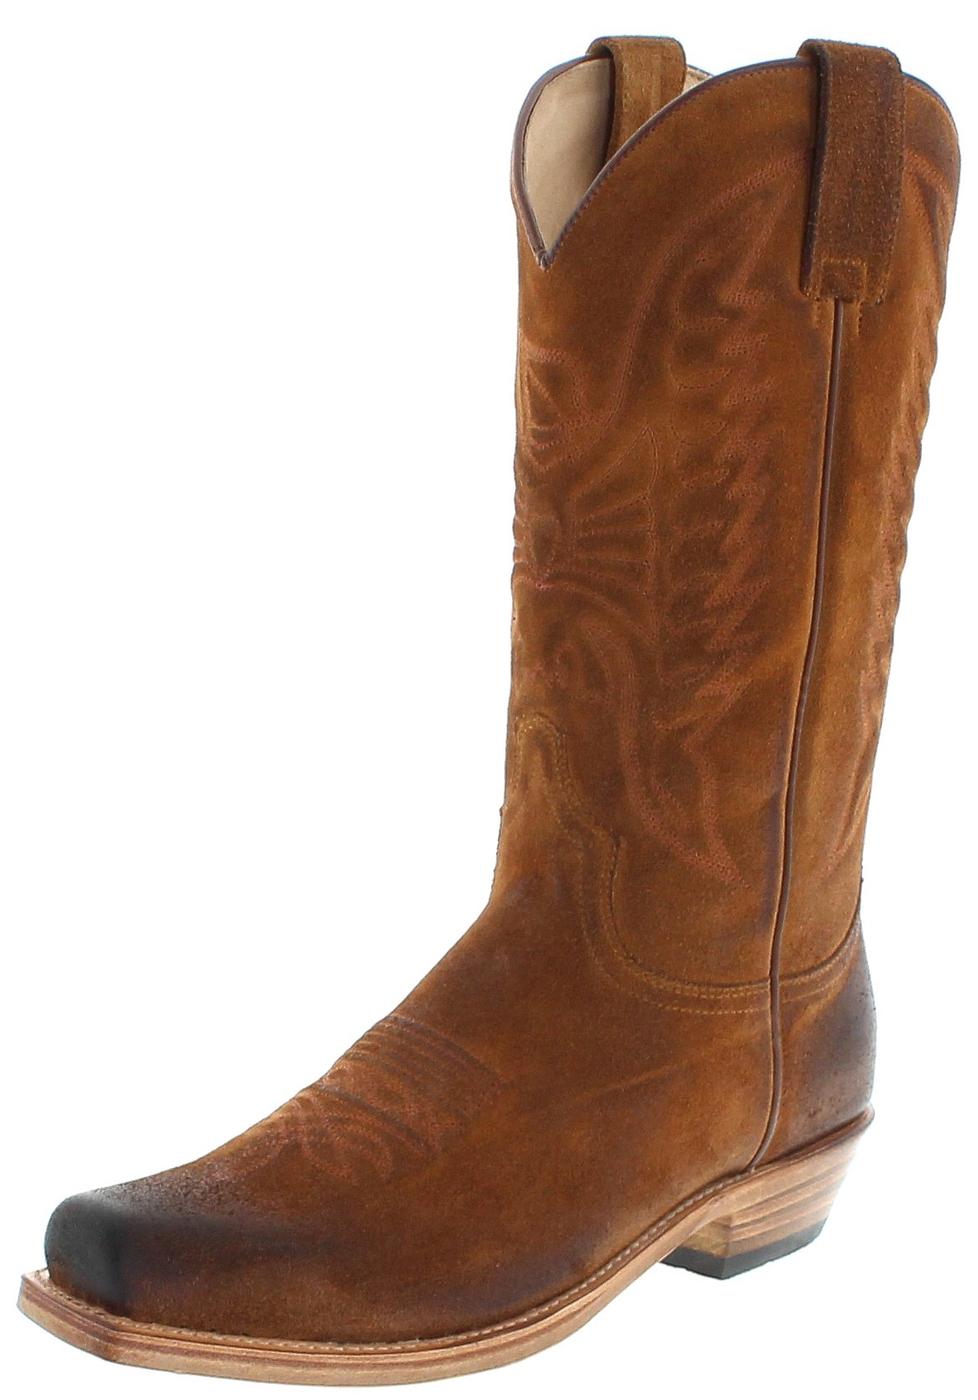 Sendra Boots 2073-58 Camello Western boot - beige